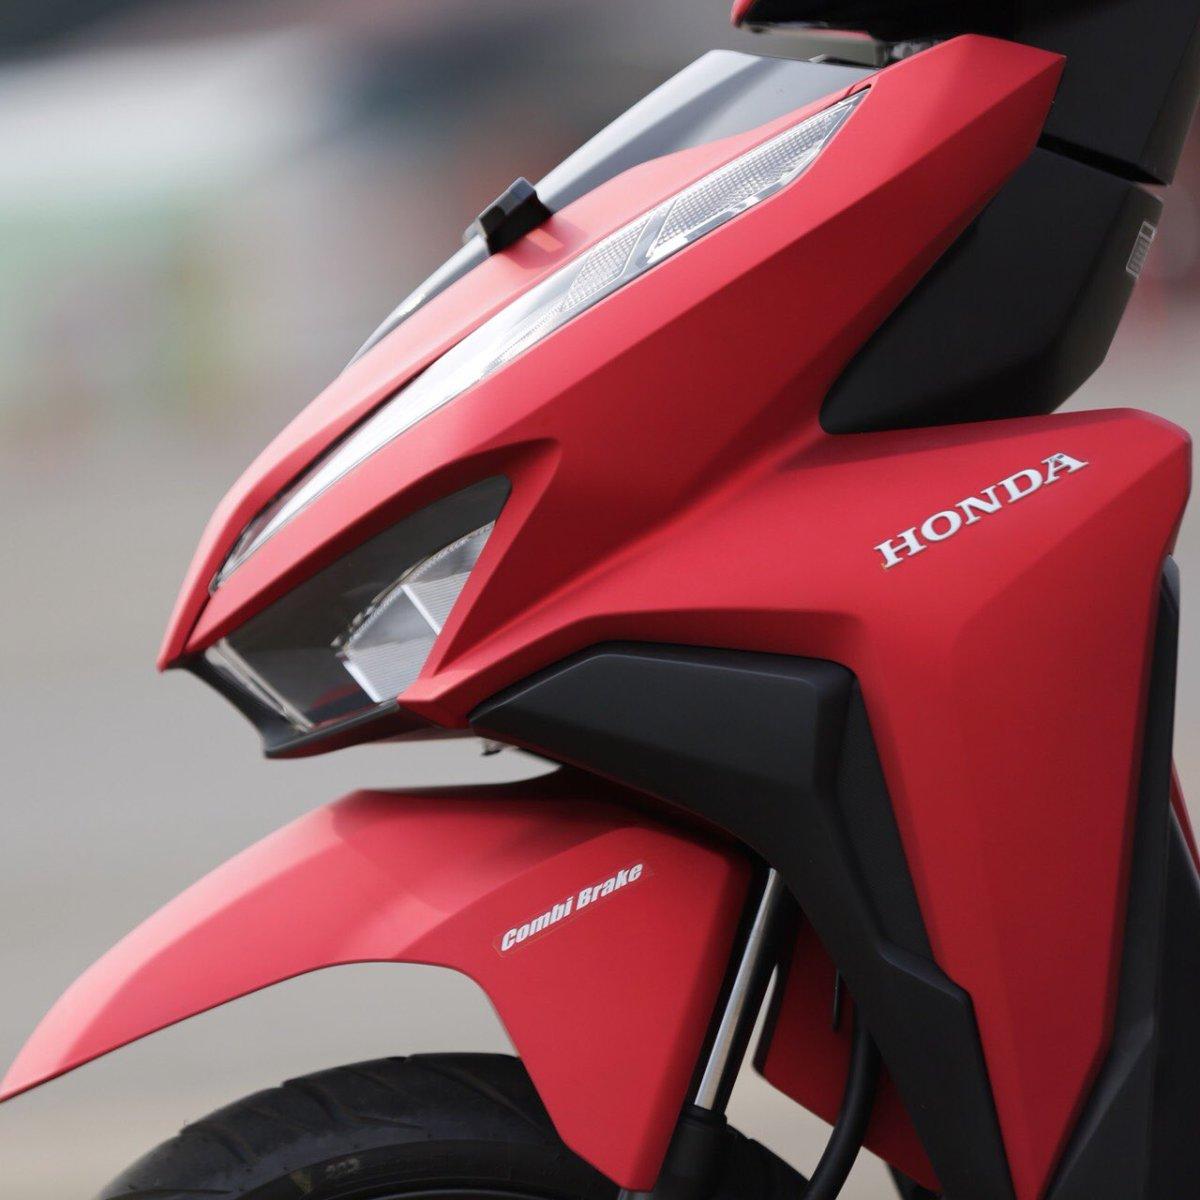 Spesifikasi Harga Dan Pilihan Warna Model Baru All New Honda Vario